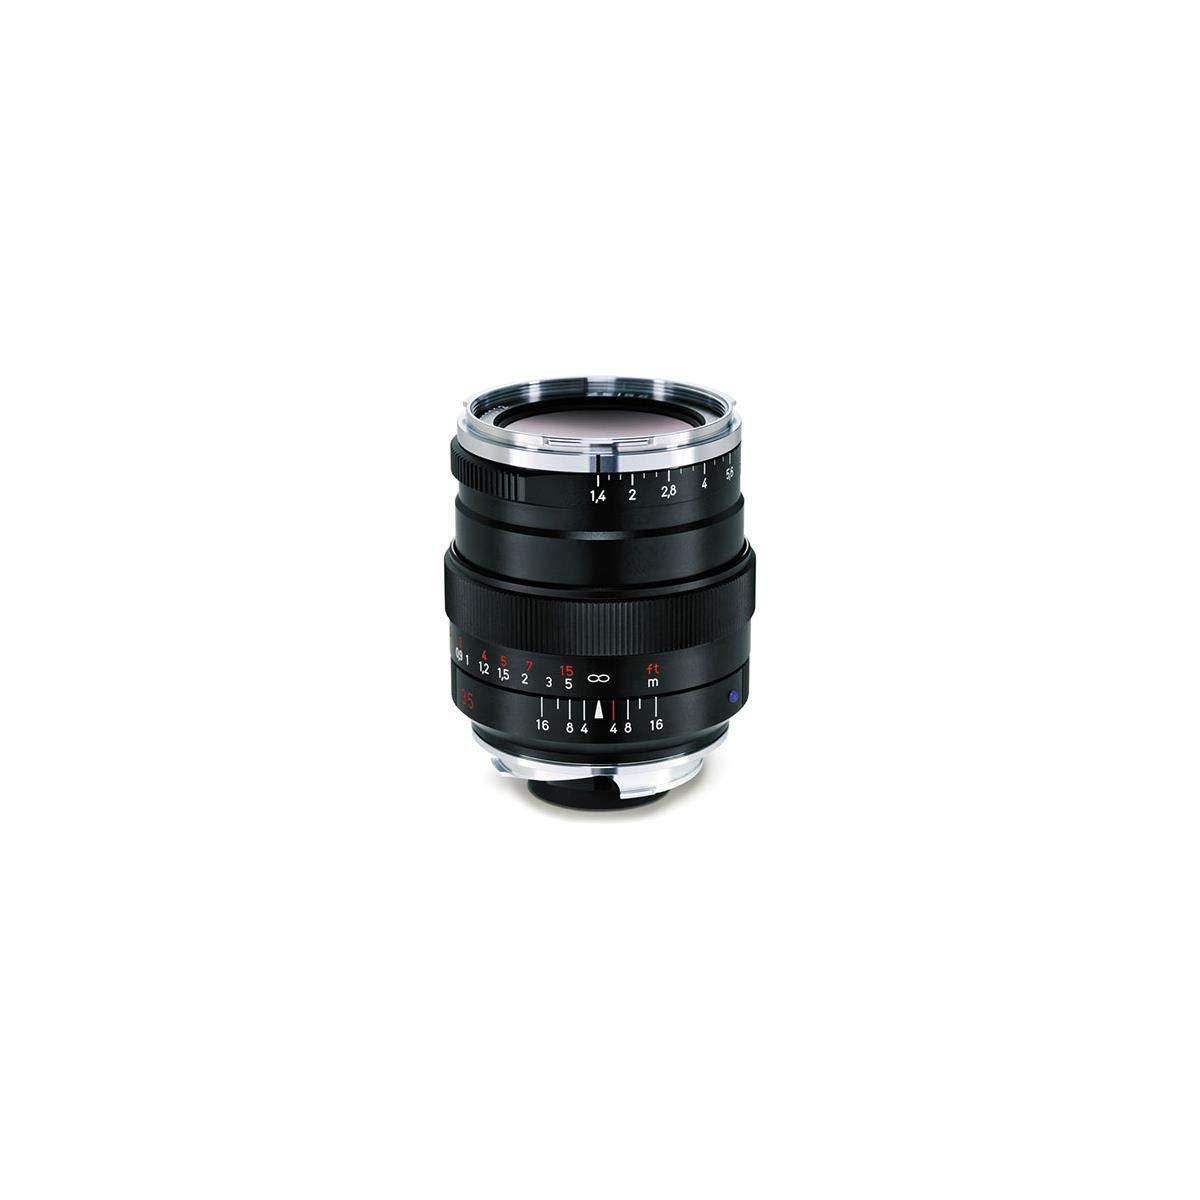 Zeiss Ikon Distagon T ZM 1.4/35 Wide-Angle Camera Lens for Leica ZM-Mount Cameras, Black, Model: 000000-2112-846